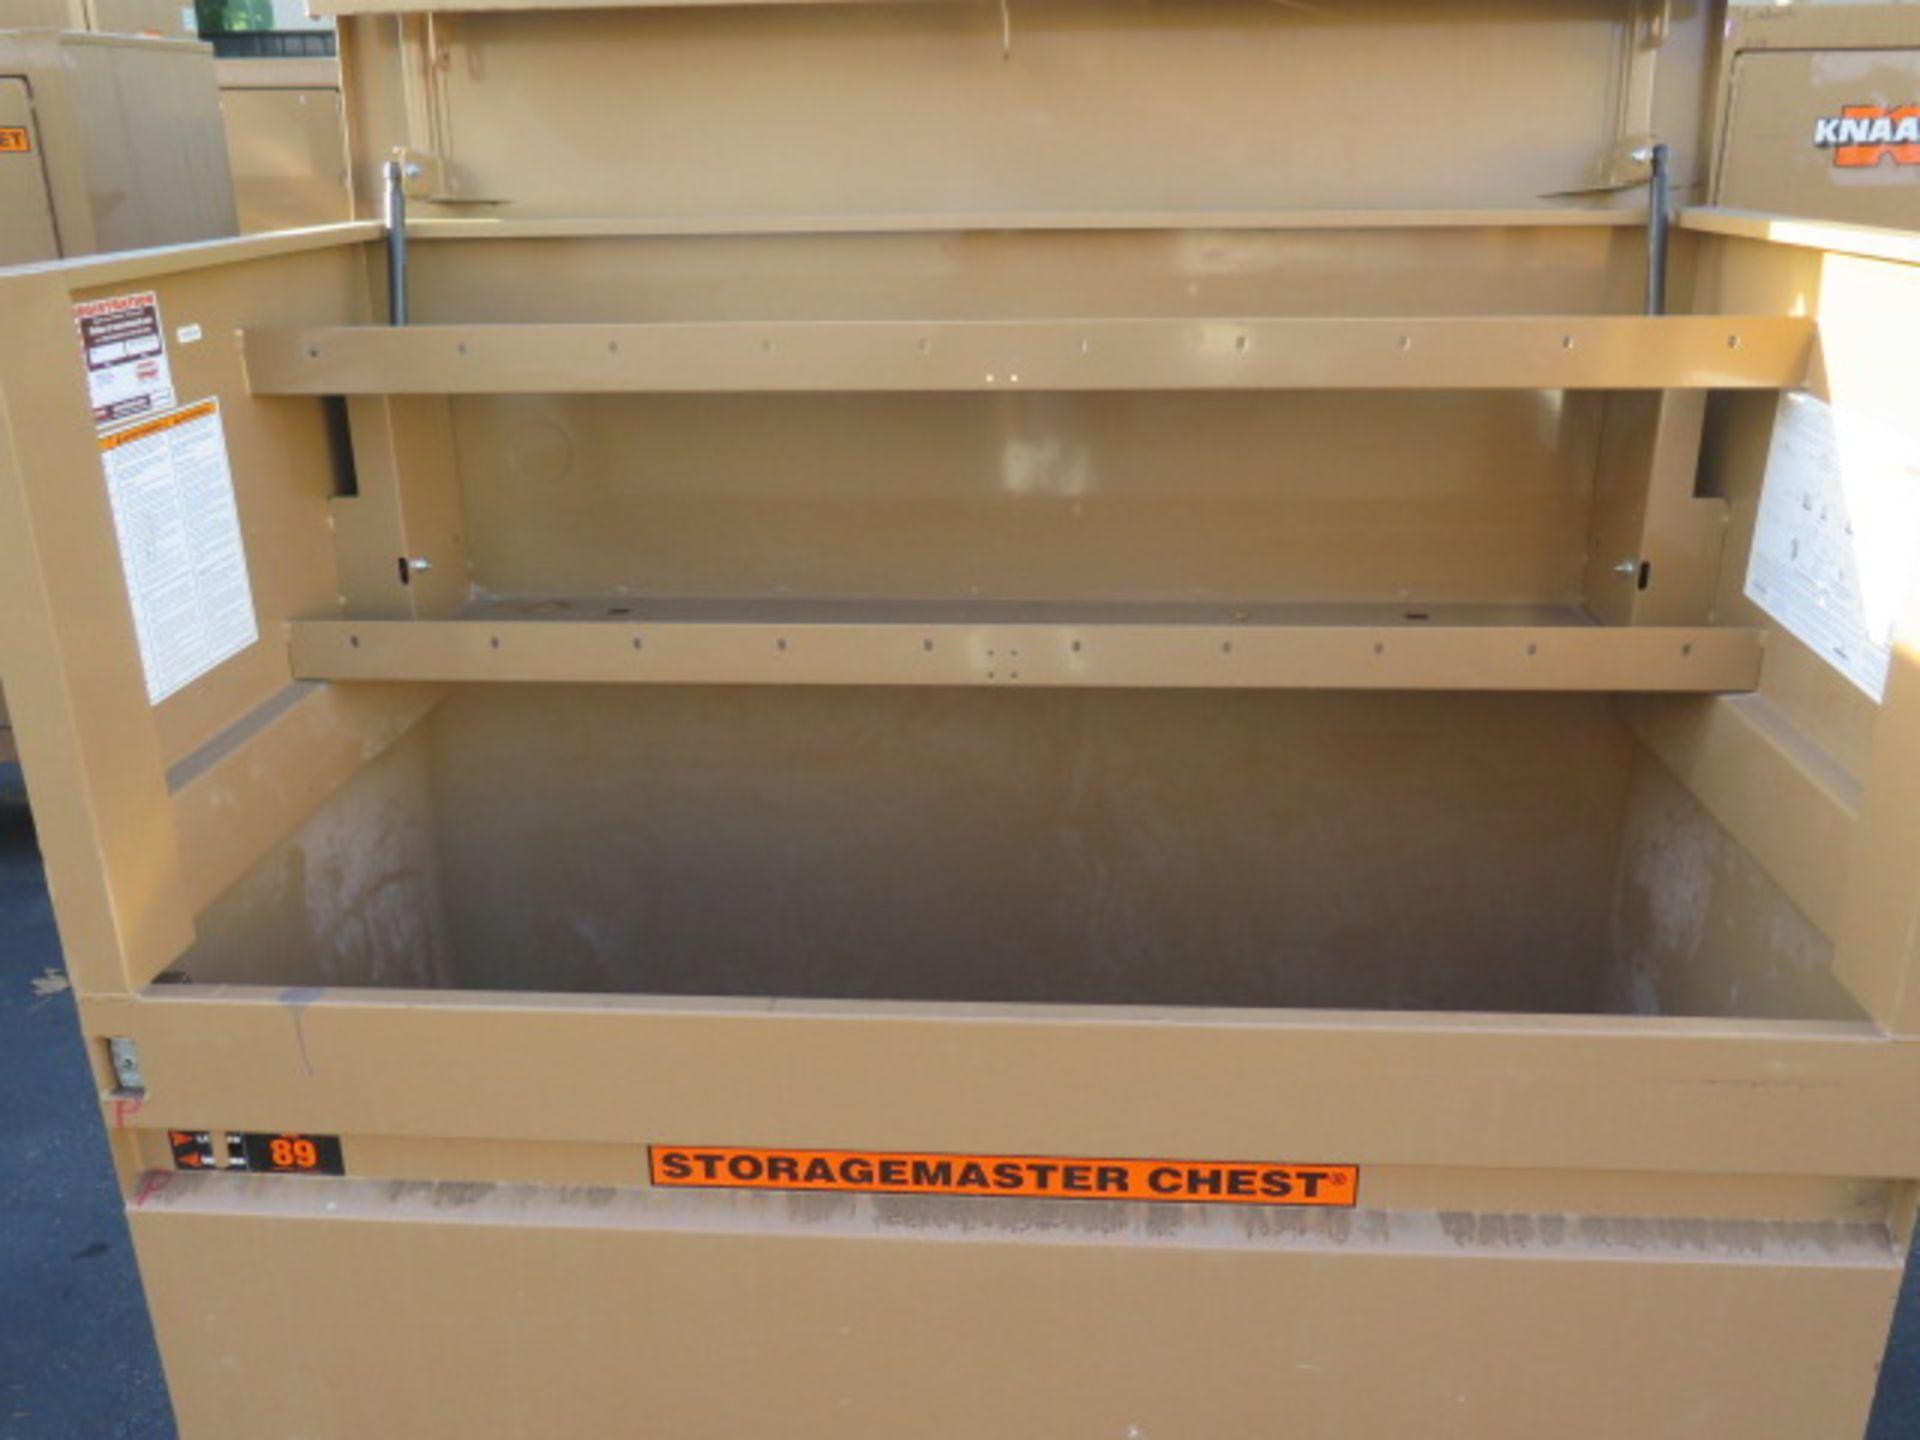 Knaack mdl. 89 Storagemaster Rolling Job Box (SOLD AS-IS - NO WARRANTY) - Image 6 of 11